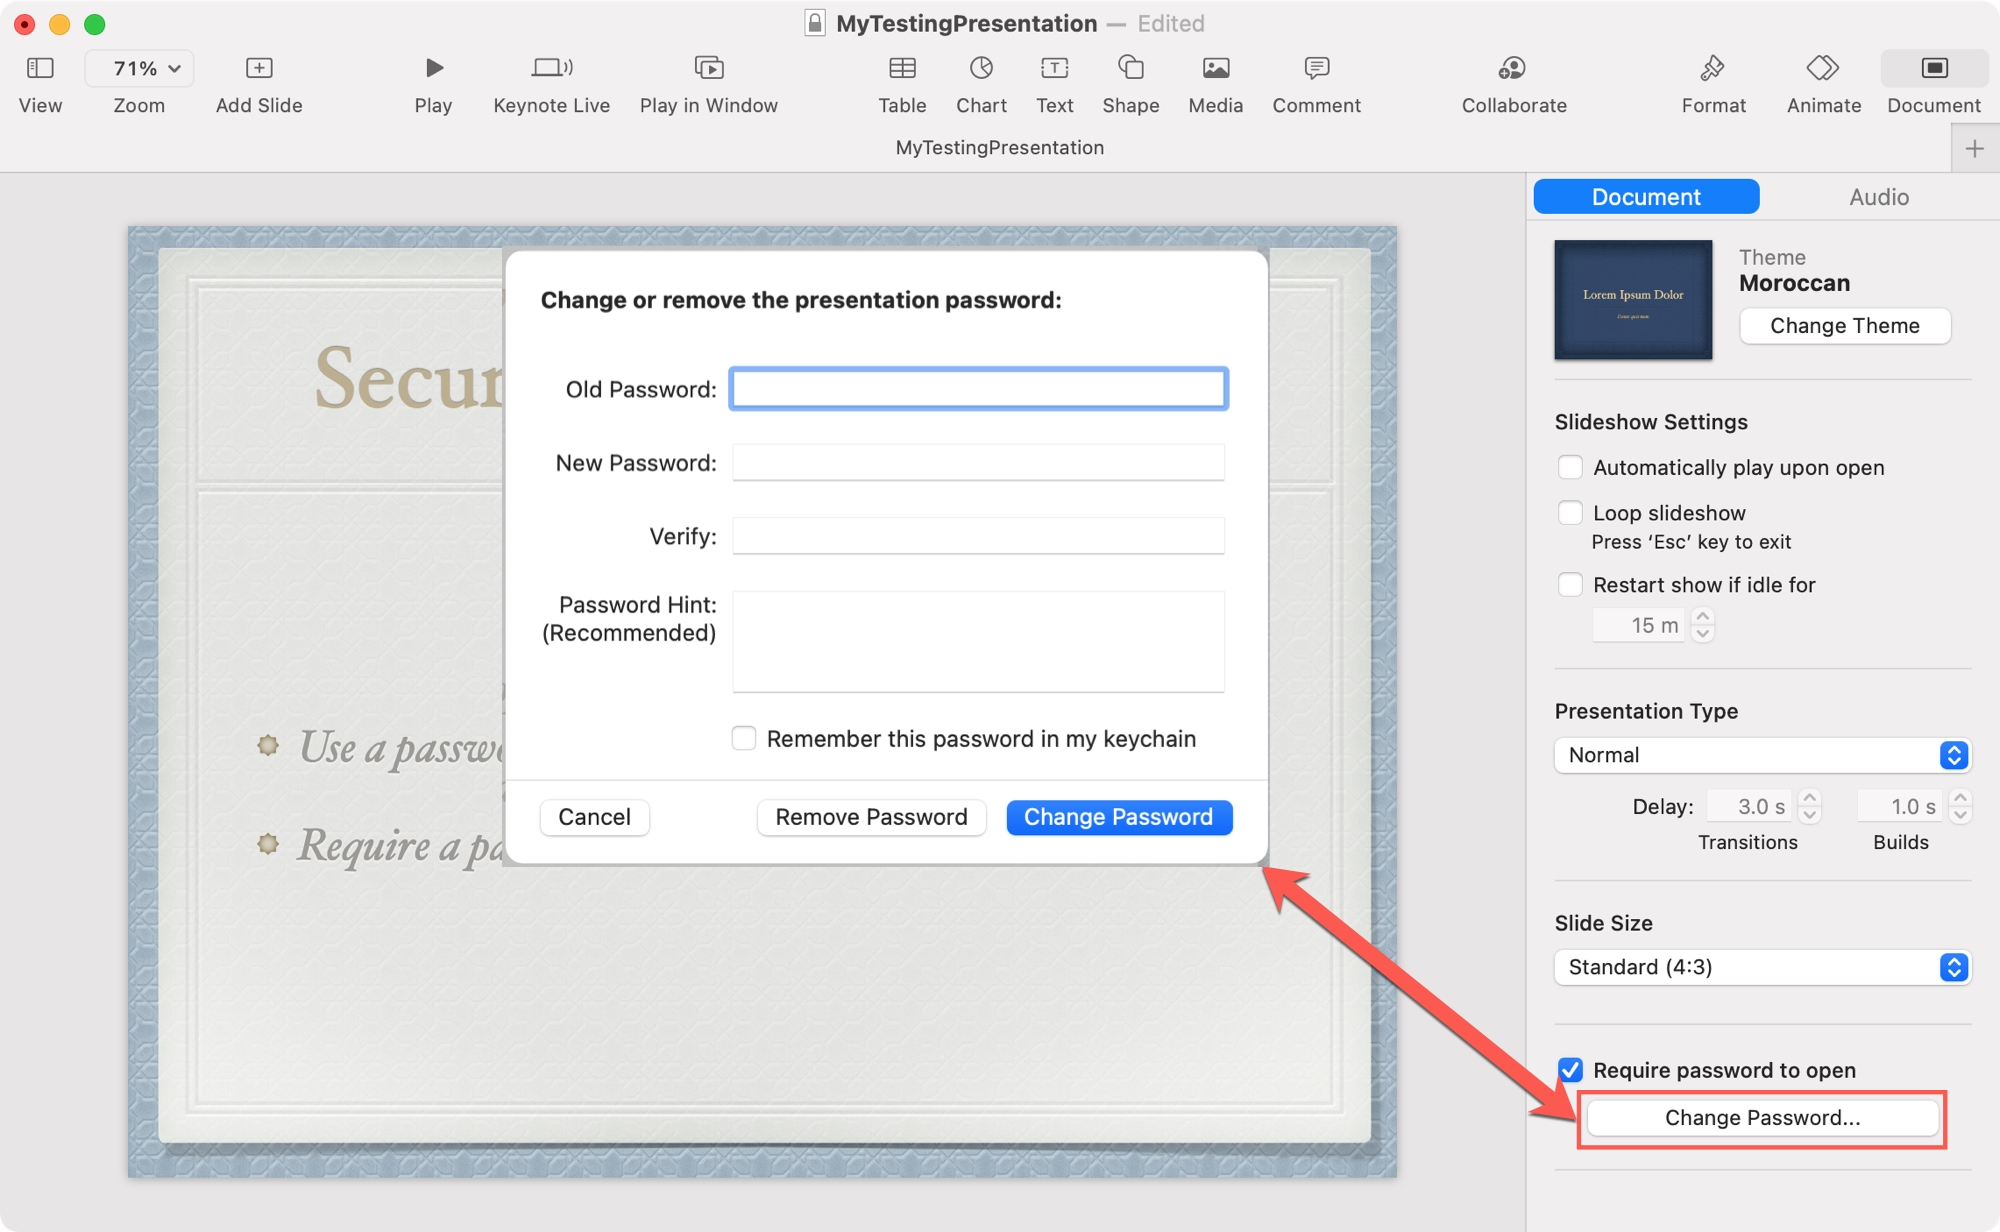 Change Password to Open Keynote on Mac